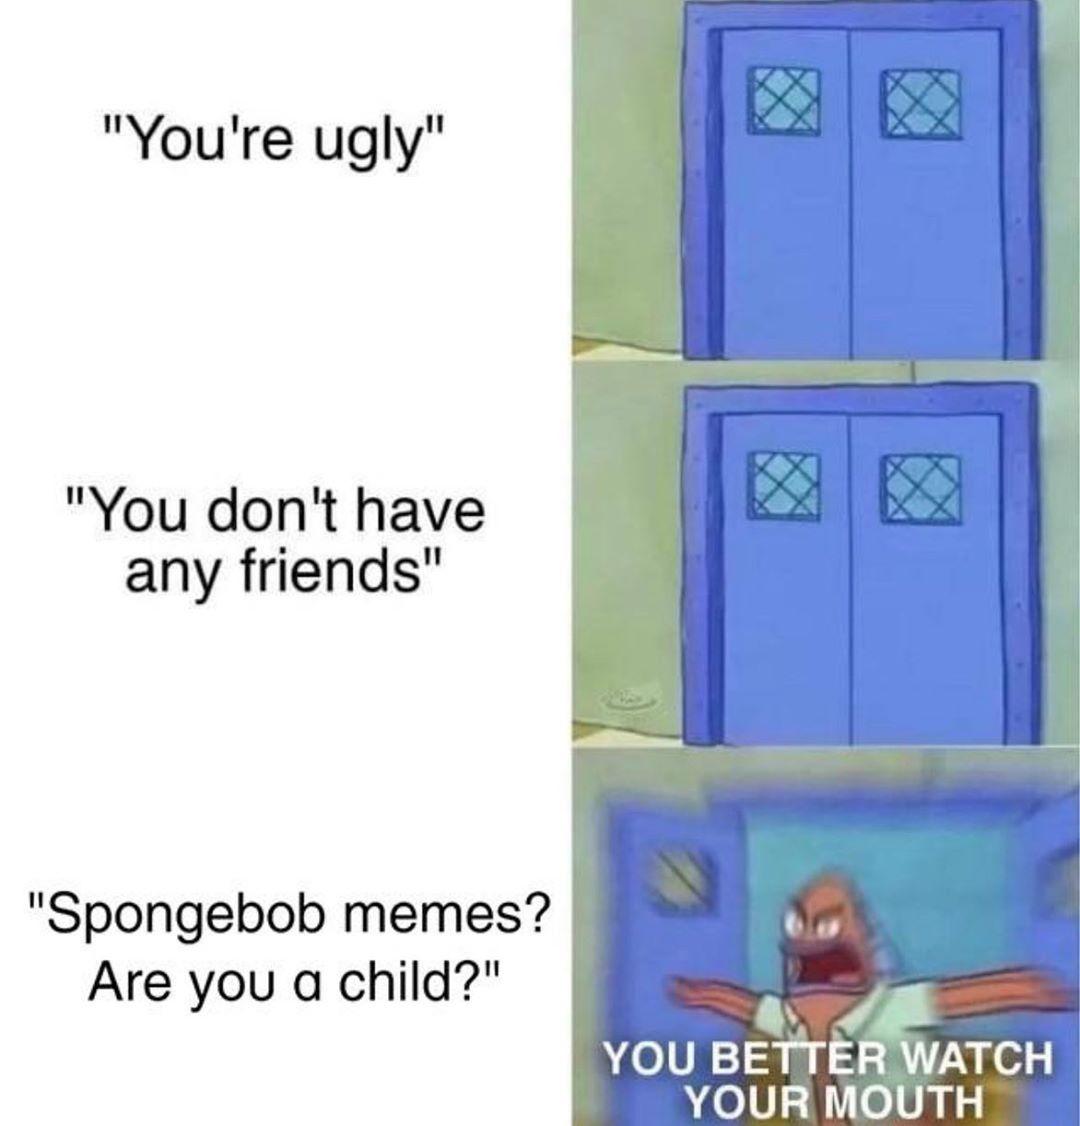 Meme S Quotes Memes Its Memes Laughing Memes Memes Quotes Funnie Memes I Meme Truthful Memes Happy Meme What Memes Enco In 2020 Memes Funny Memes Me Too Meme